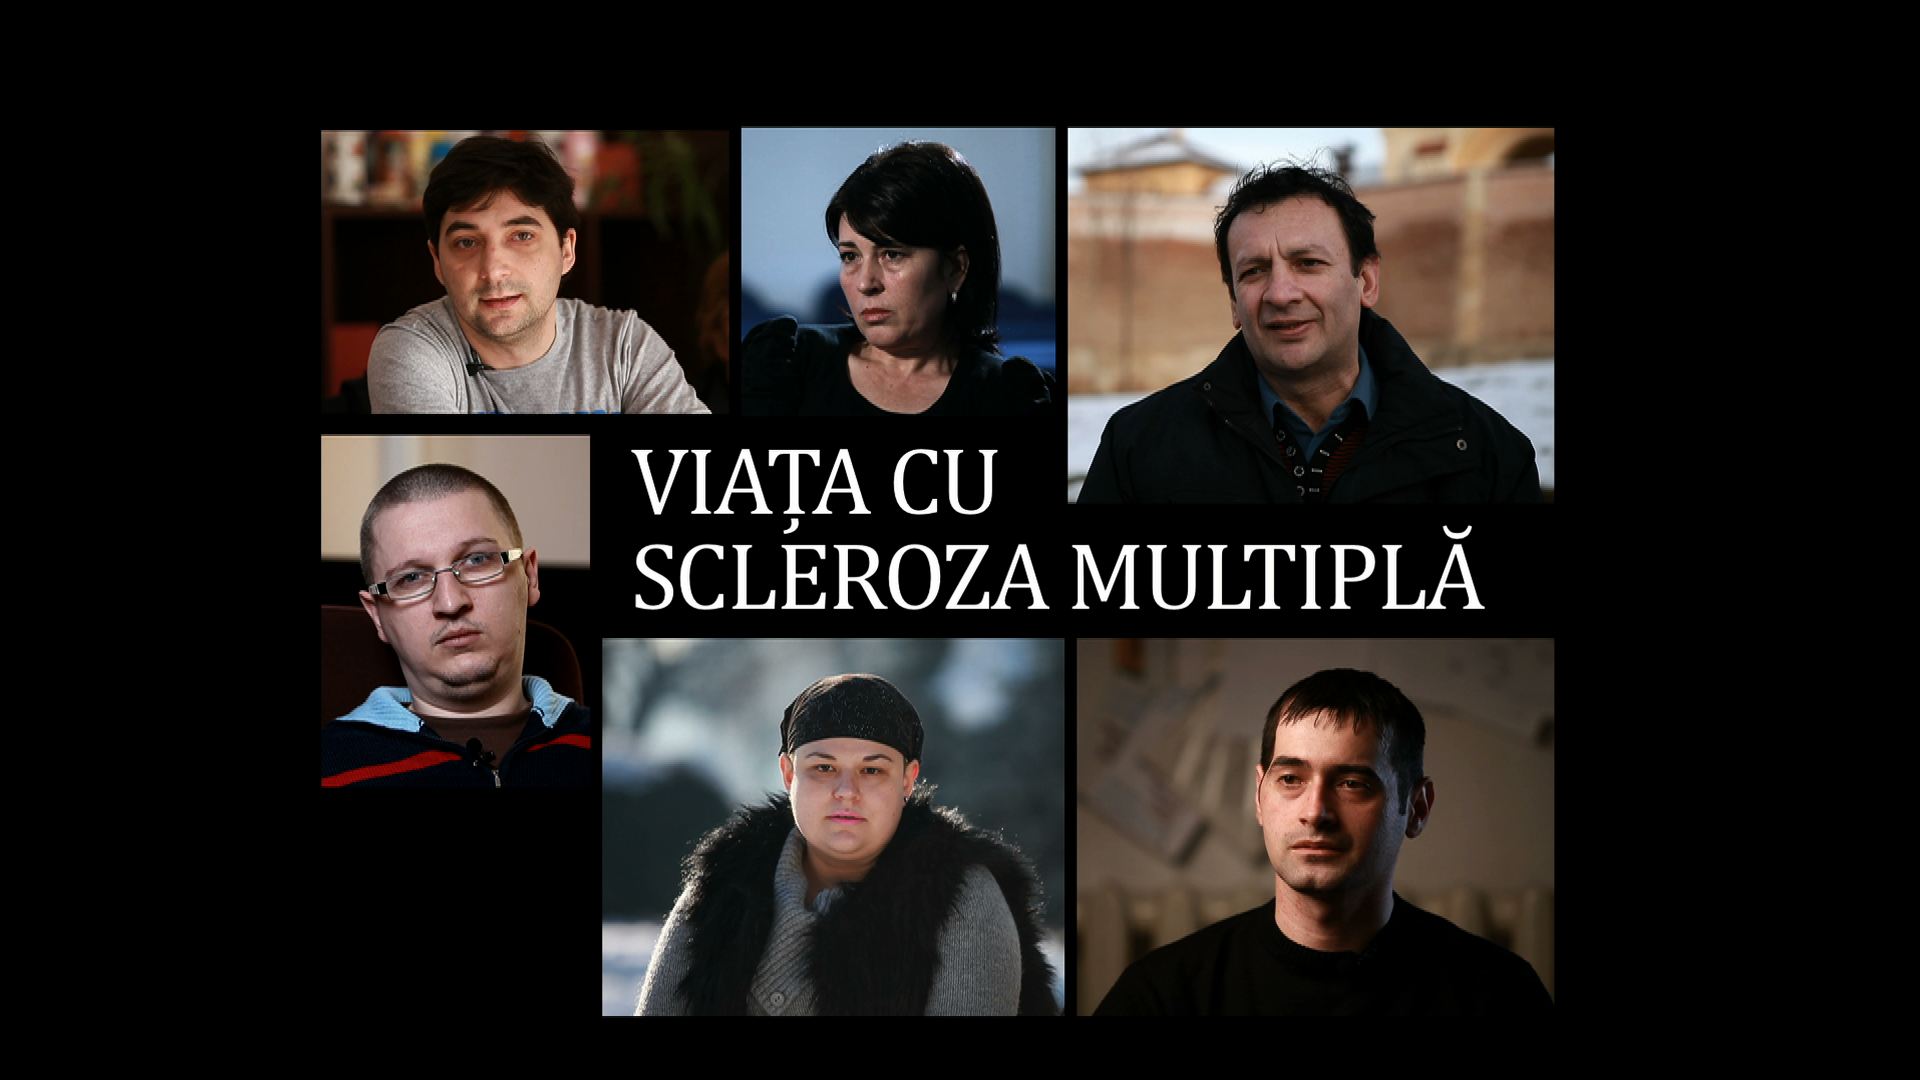 Life With Multiple Sclerosis (Viata cu Scleroza Multipla)